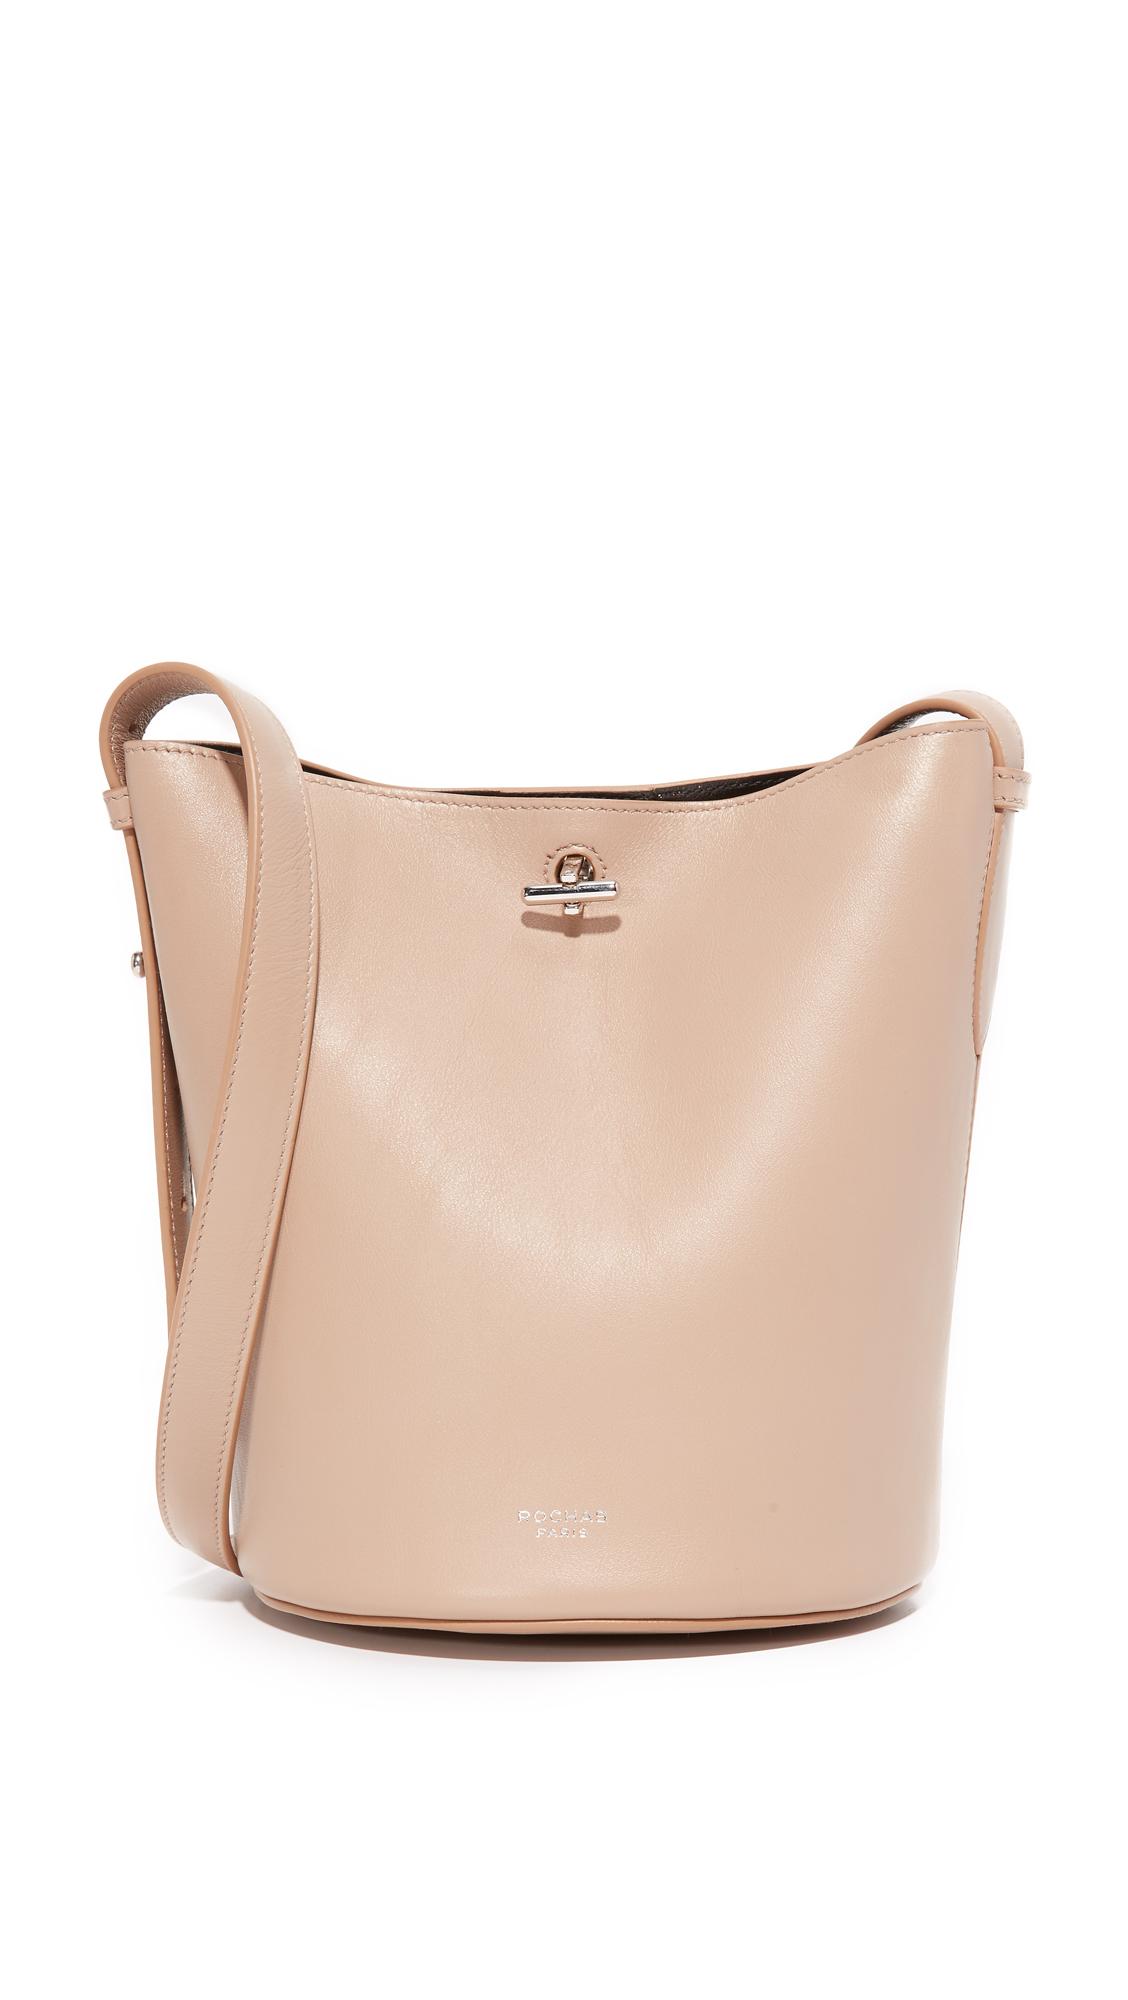 rochas female rochas bucket bag light beige